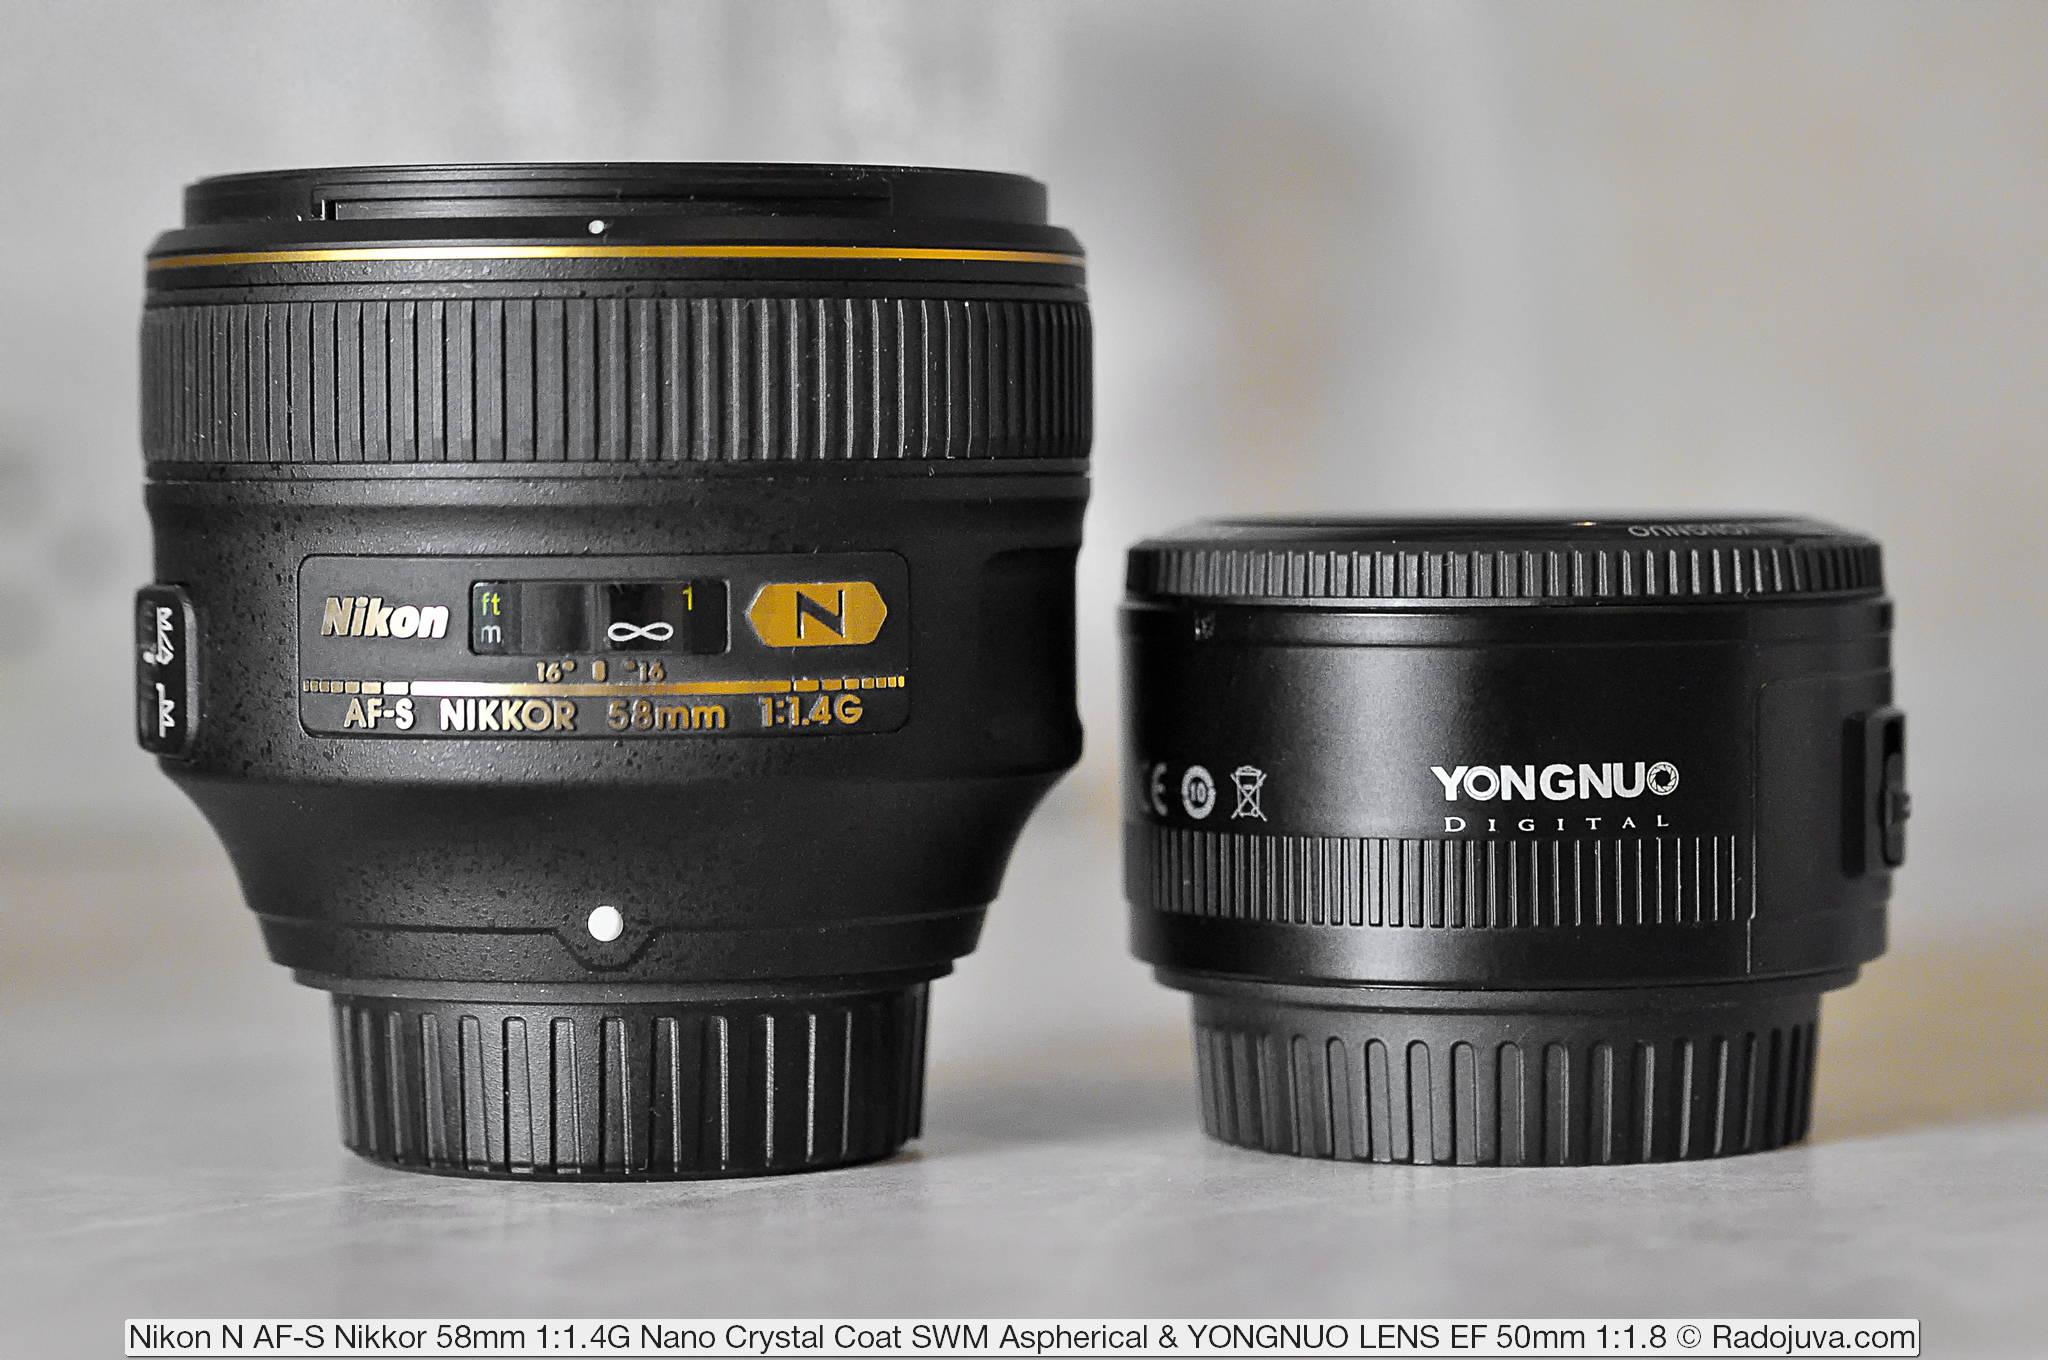 Nikon N AF-S Nikkor 58mm 1:1.4G Nano Crystal Coat SWM Aspherical и YONGNUO LENS EF 50mm 1:1.8